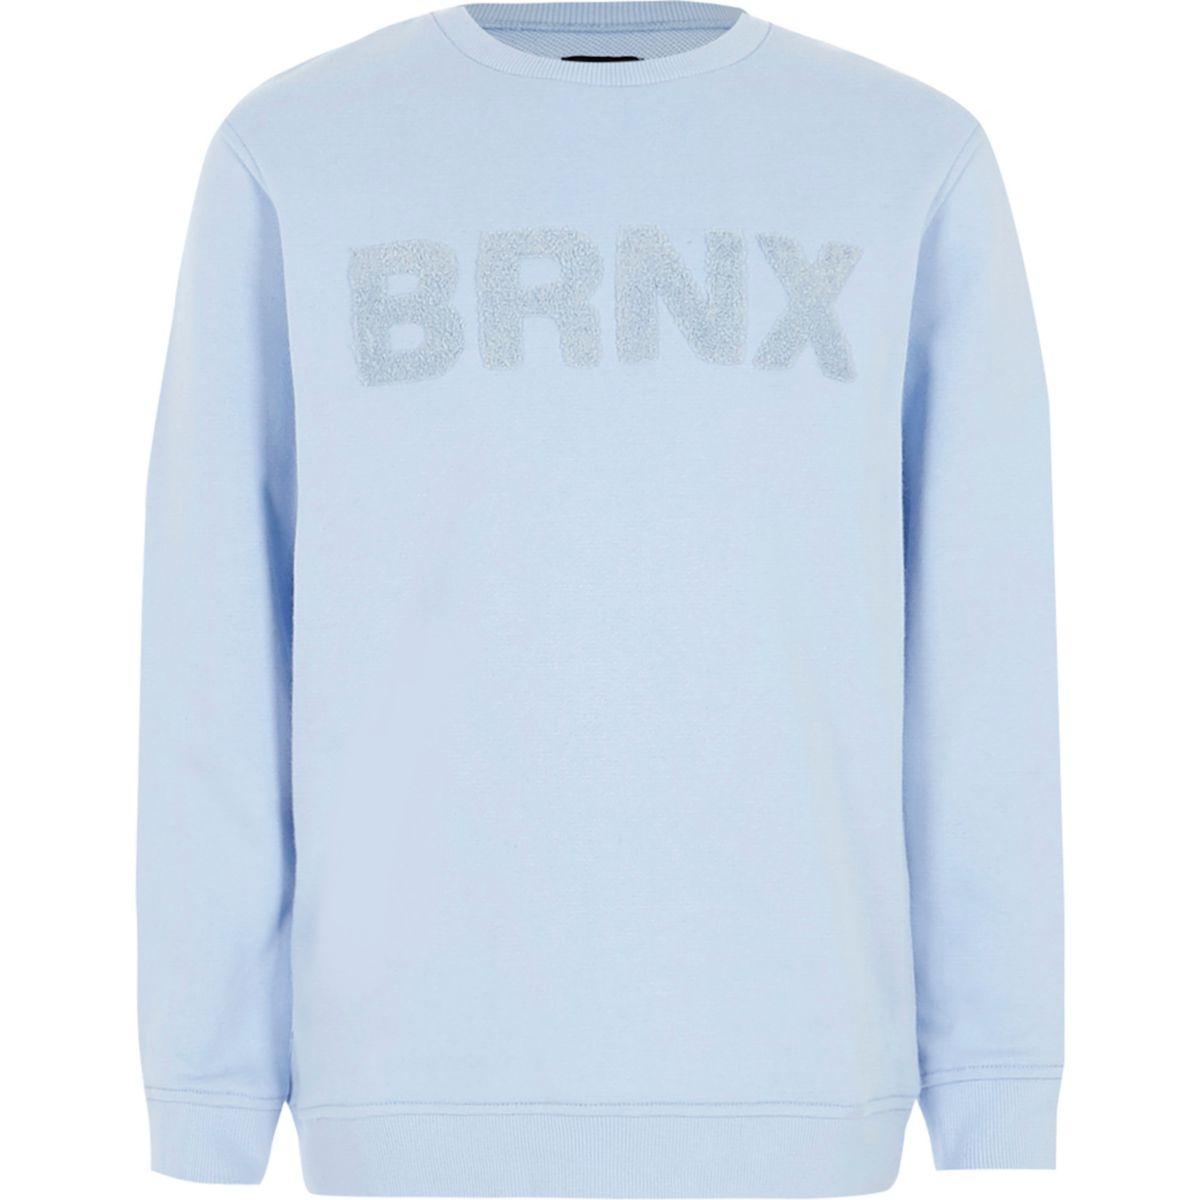 Boys light blue 'Brnx' felt sweatshirt